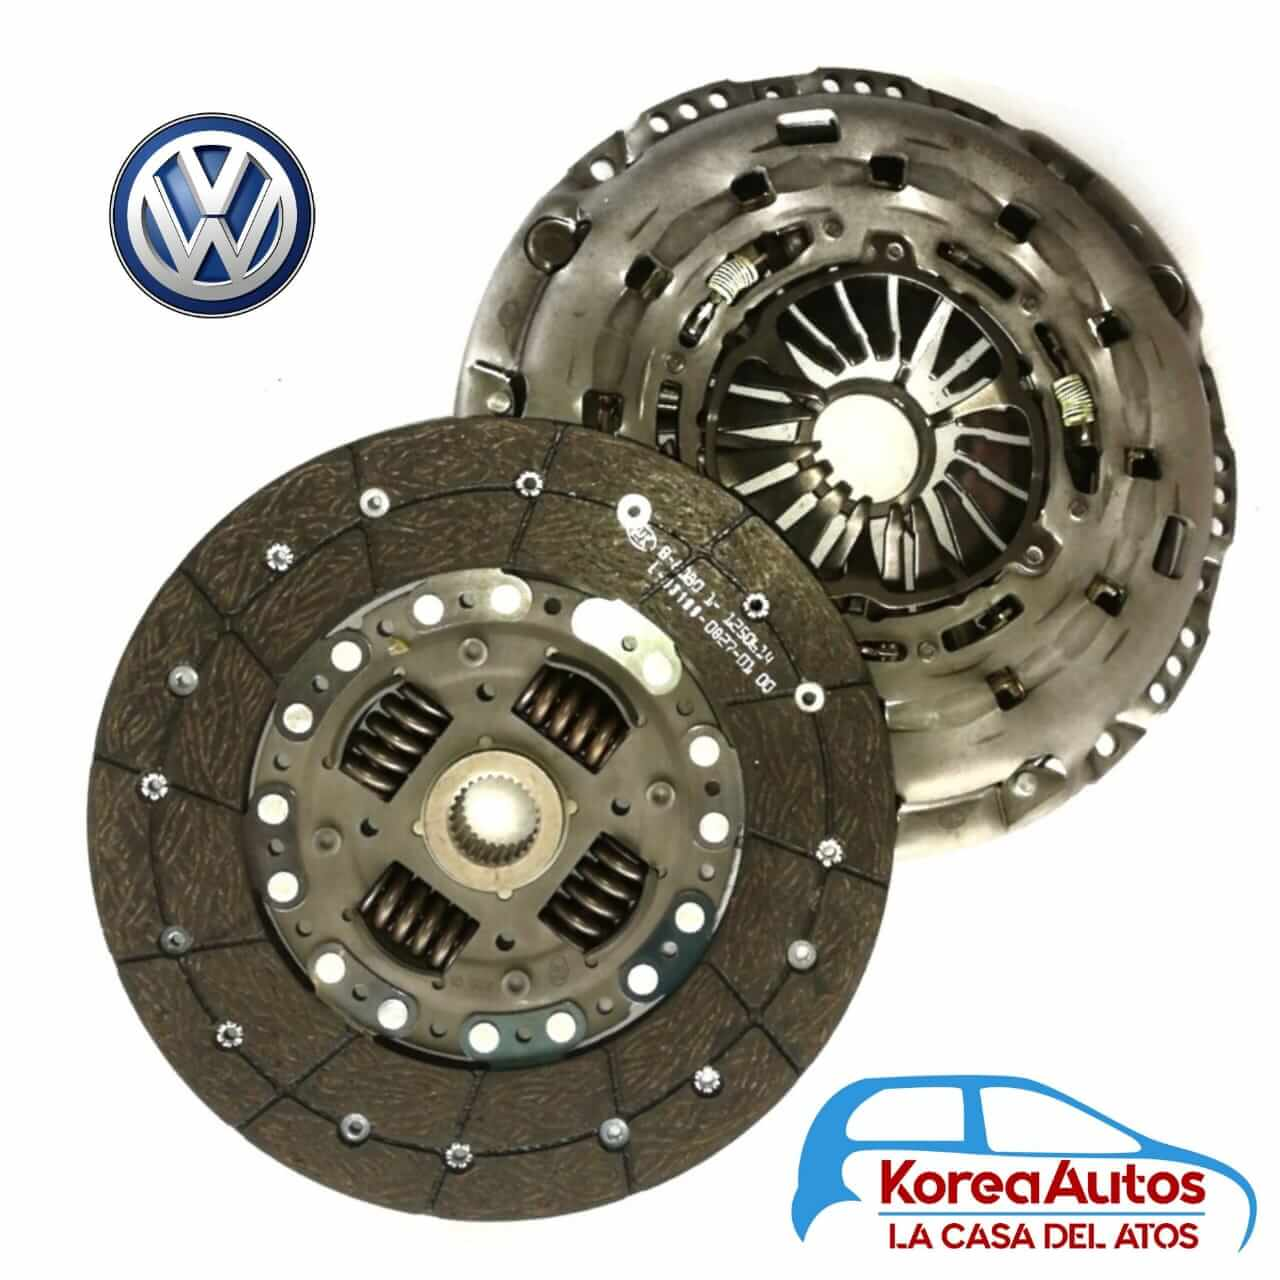 Kit de clutch / embrague Volkswagen Crafter 50 pacha doble